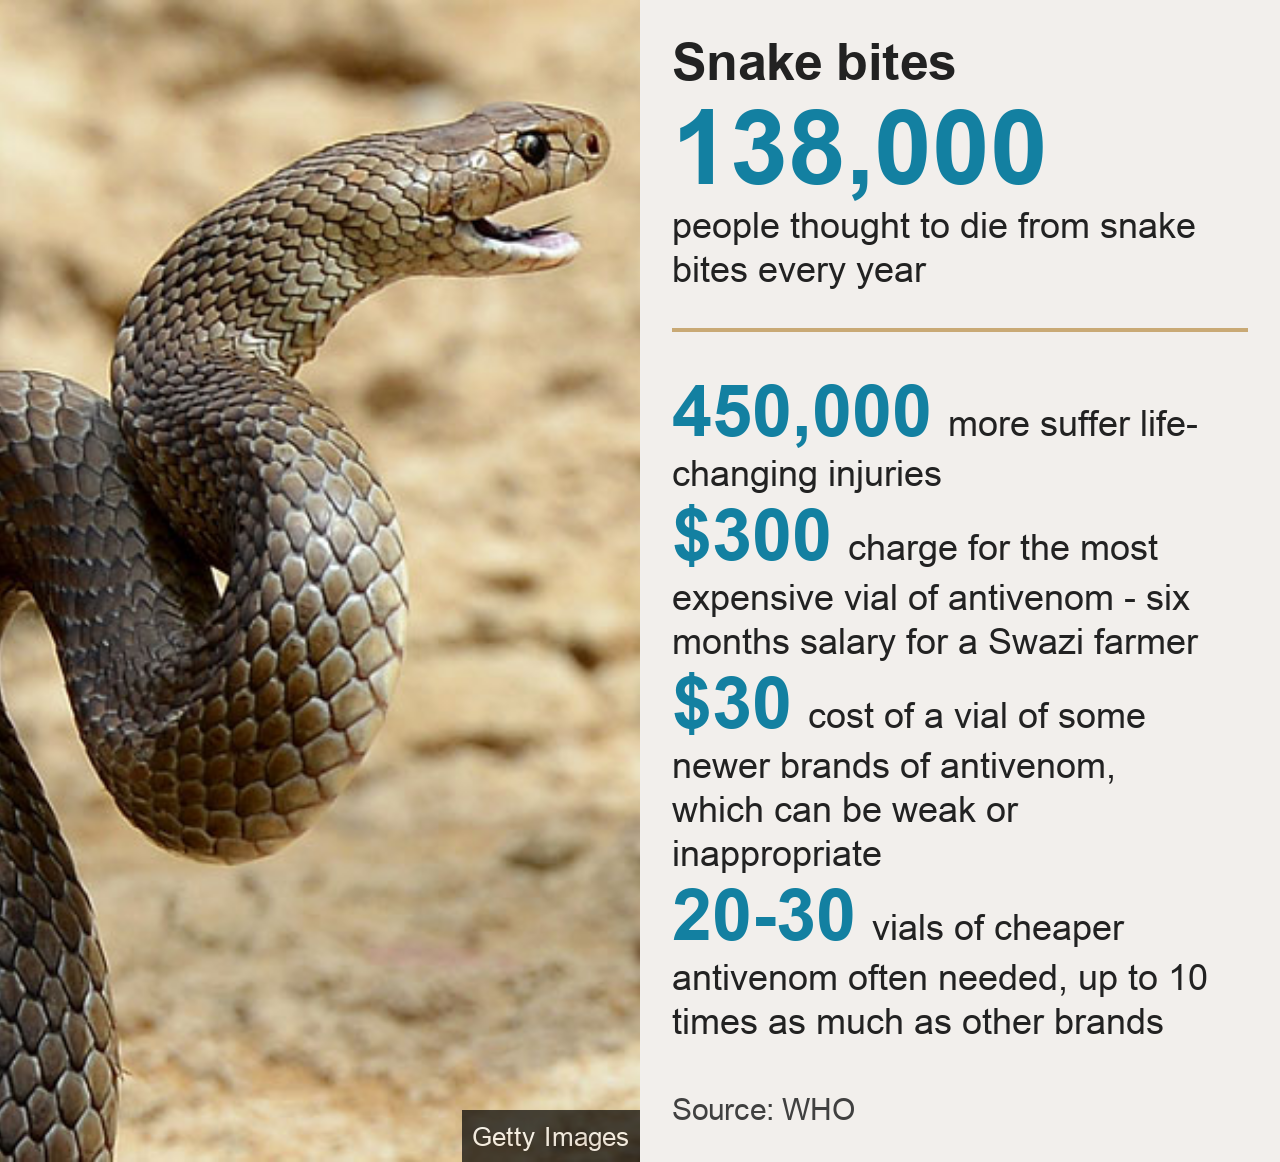 Key snakebite figures